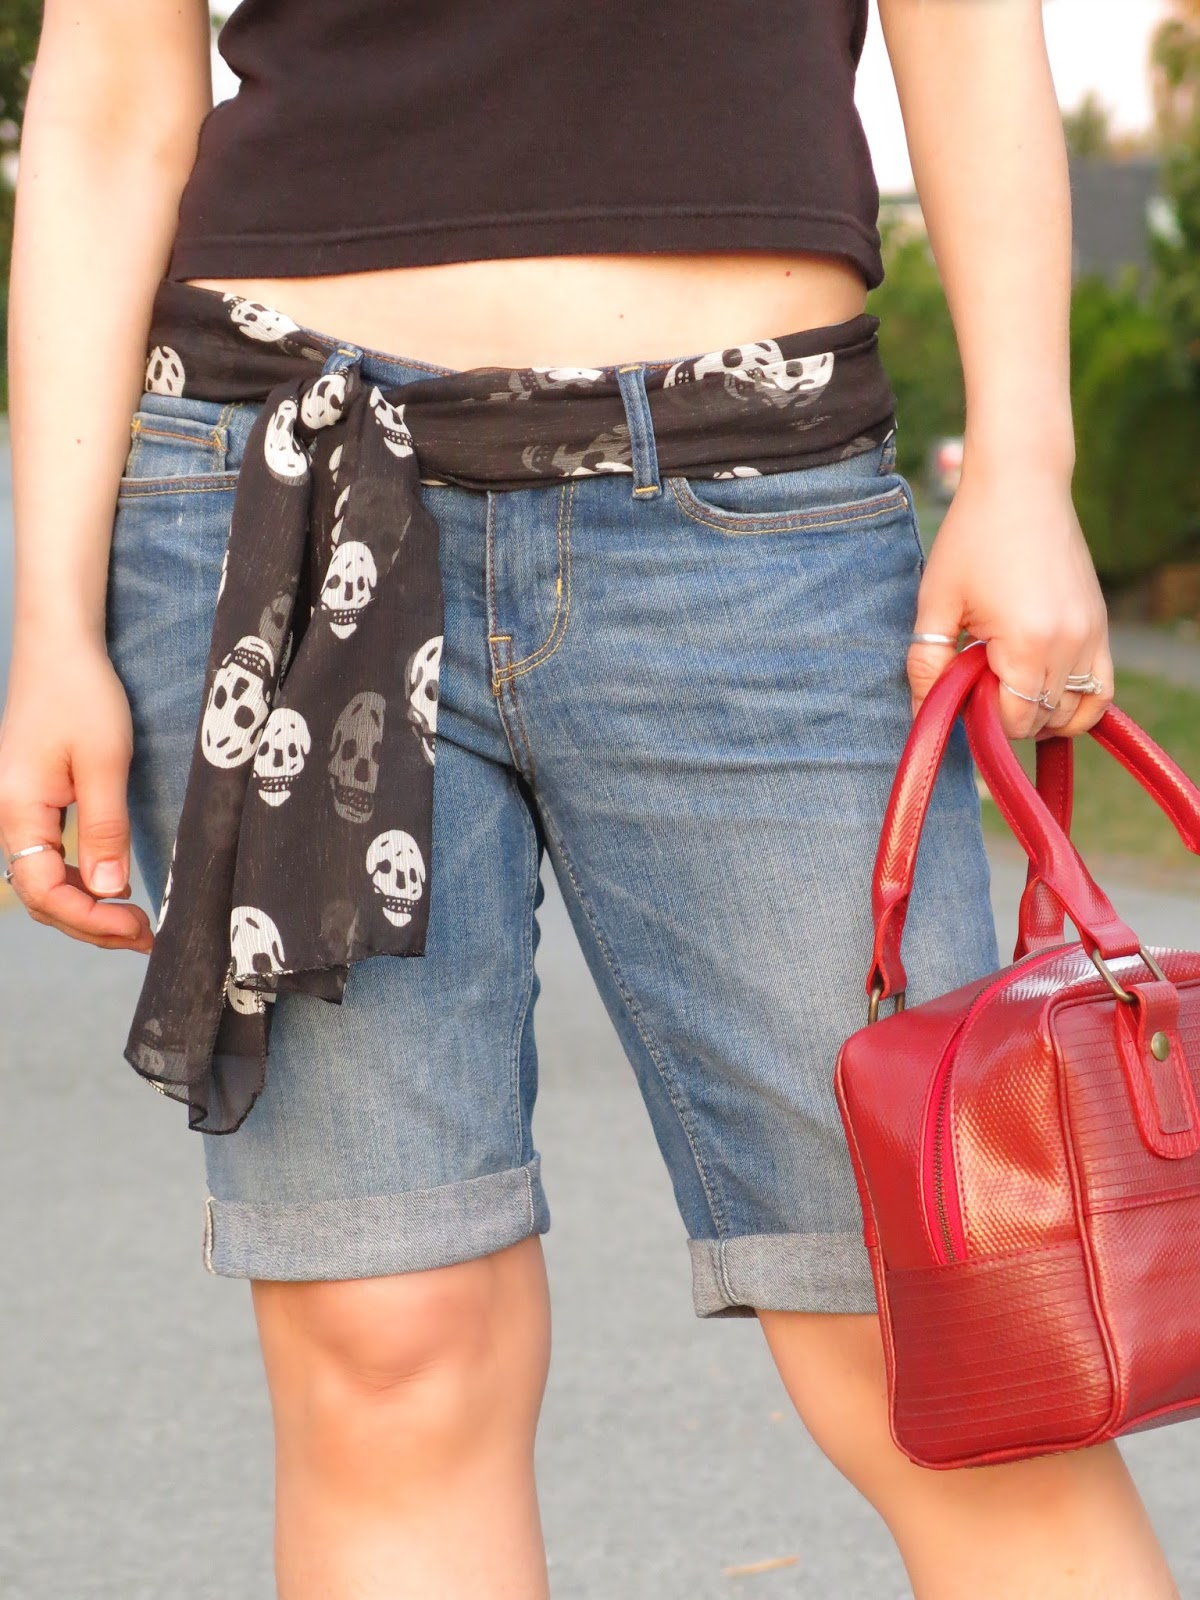 denim bermuda shorts, scull-print scarf, and Elvis & Kresse bag